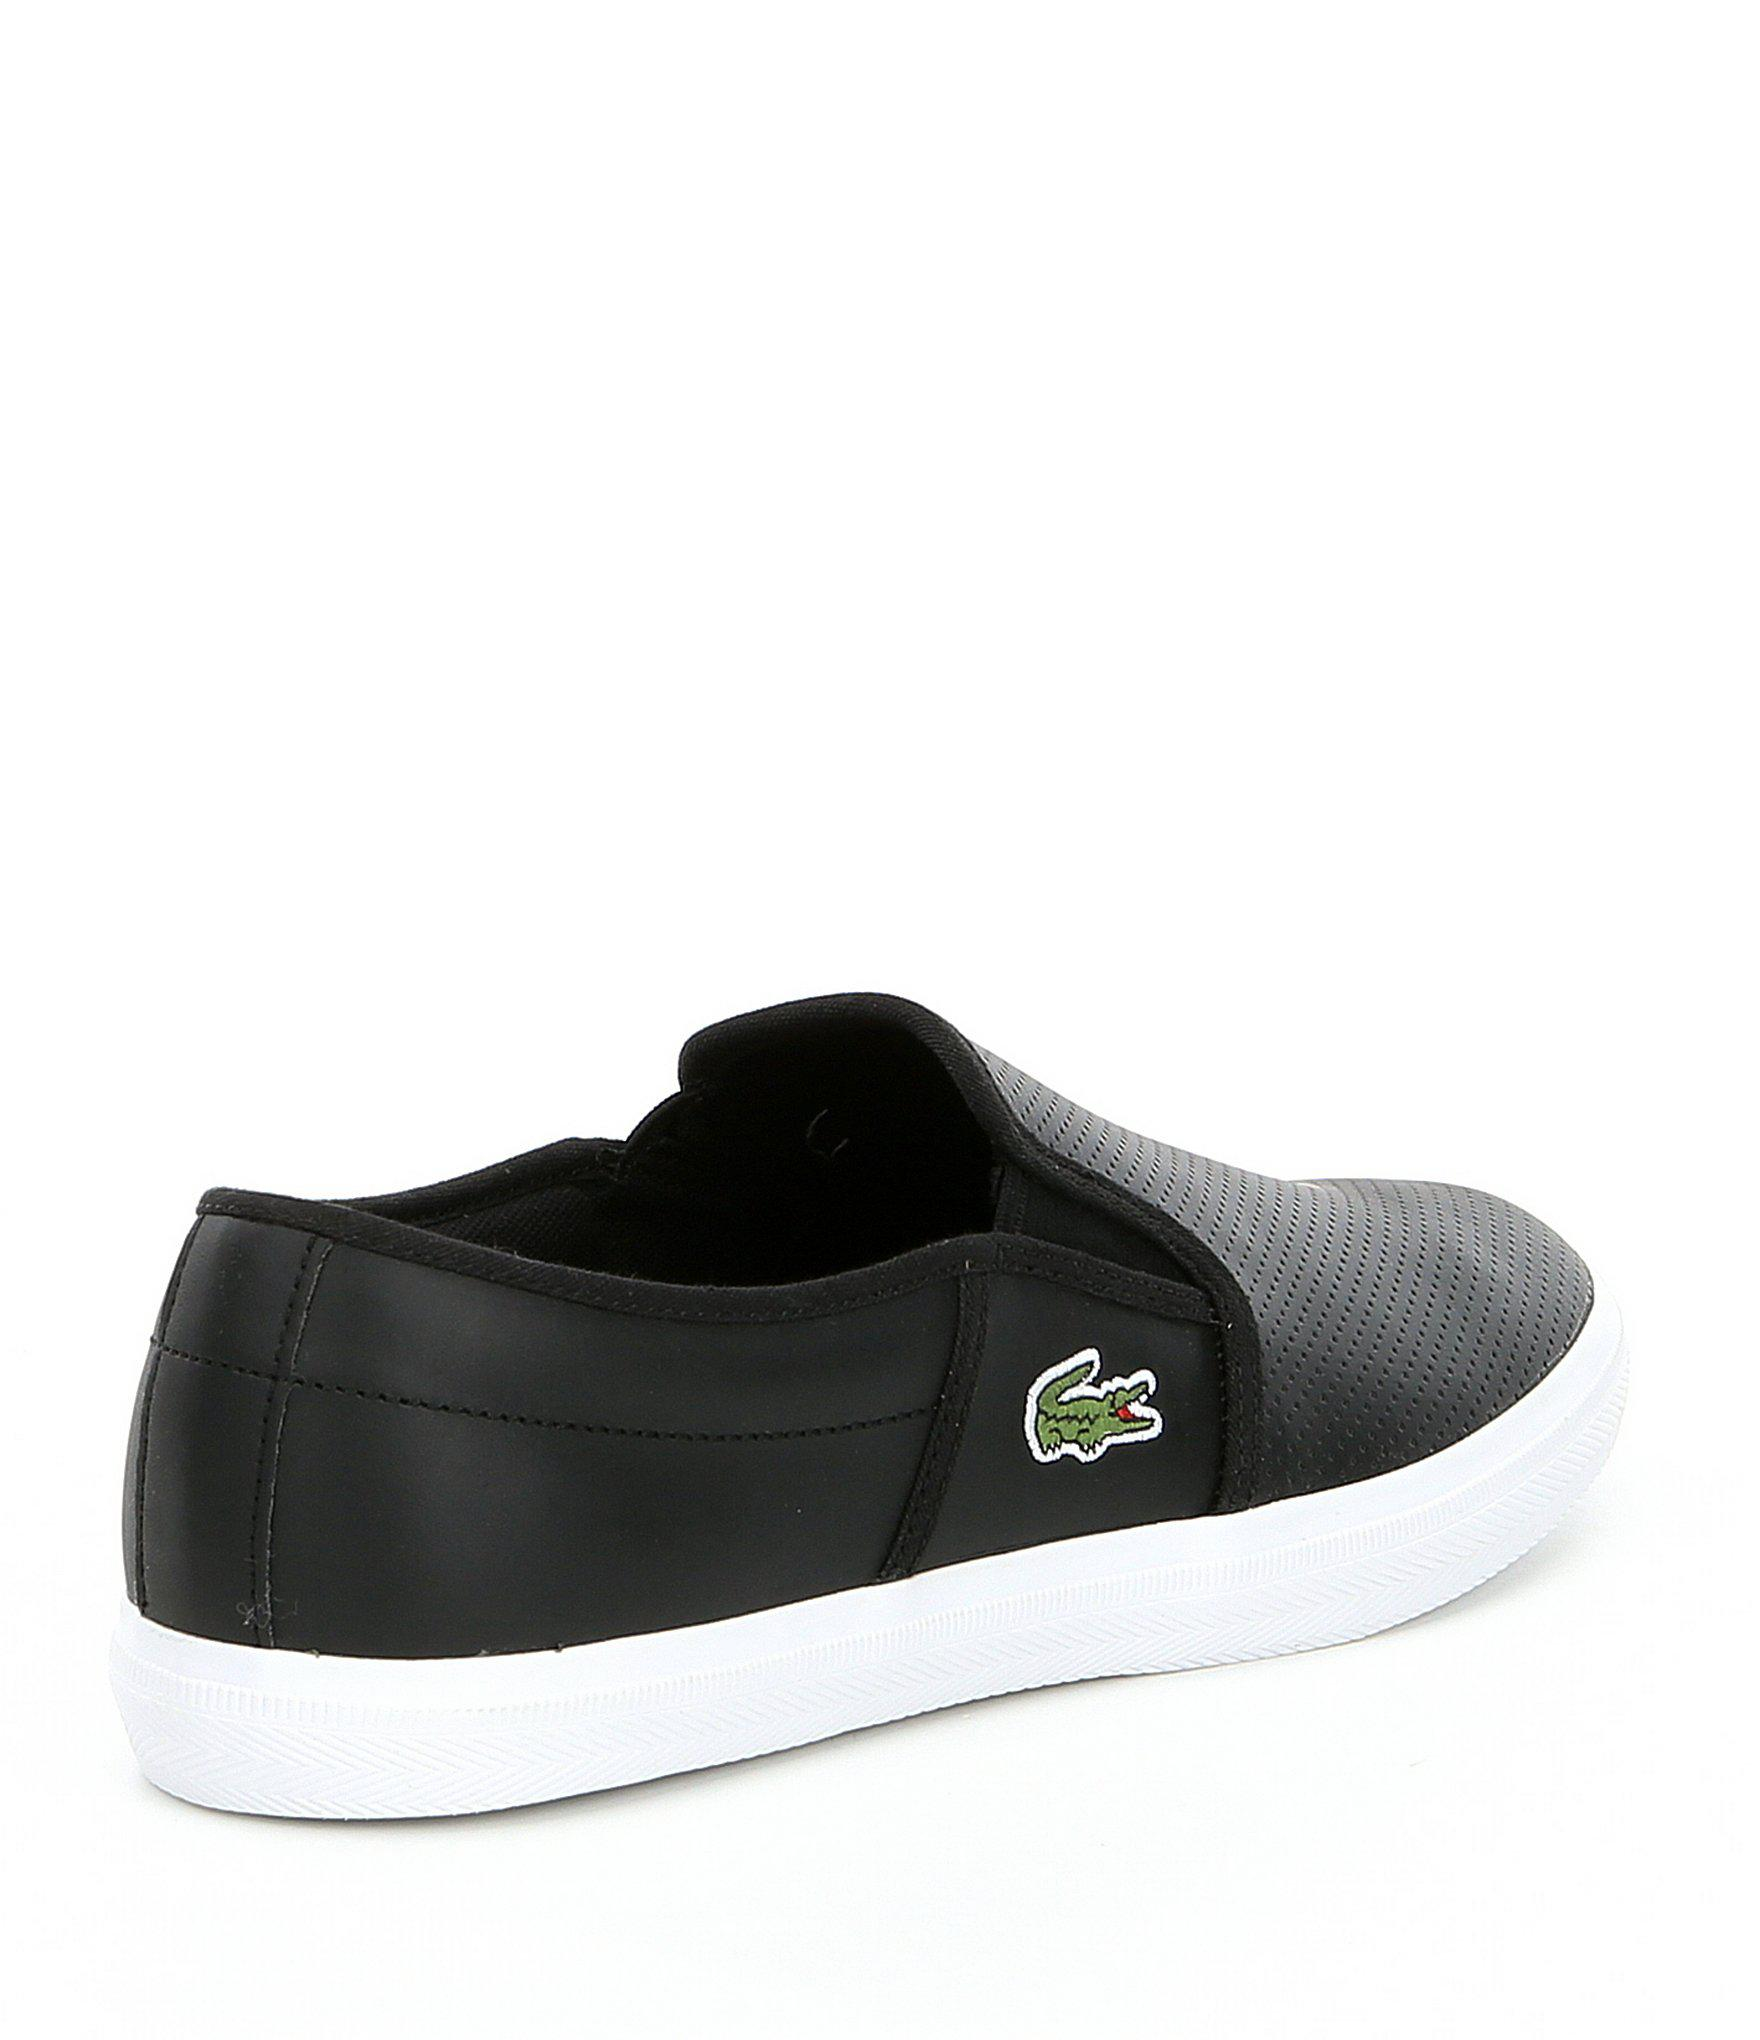 998fa8324ff7d Lacoste - Black Men s Gazon Slip On Sneakers for Men - Lyst. View fullscreen